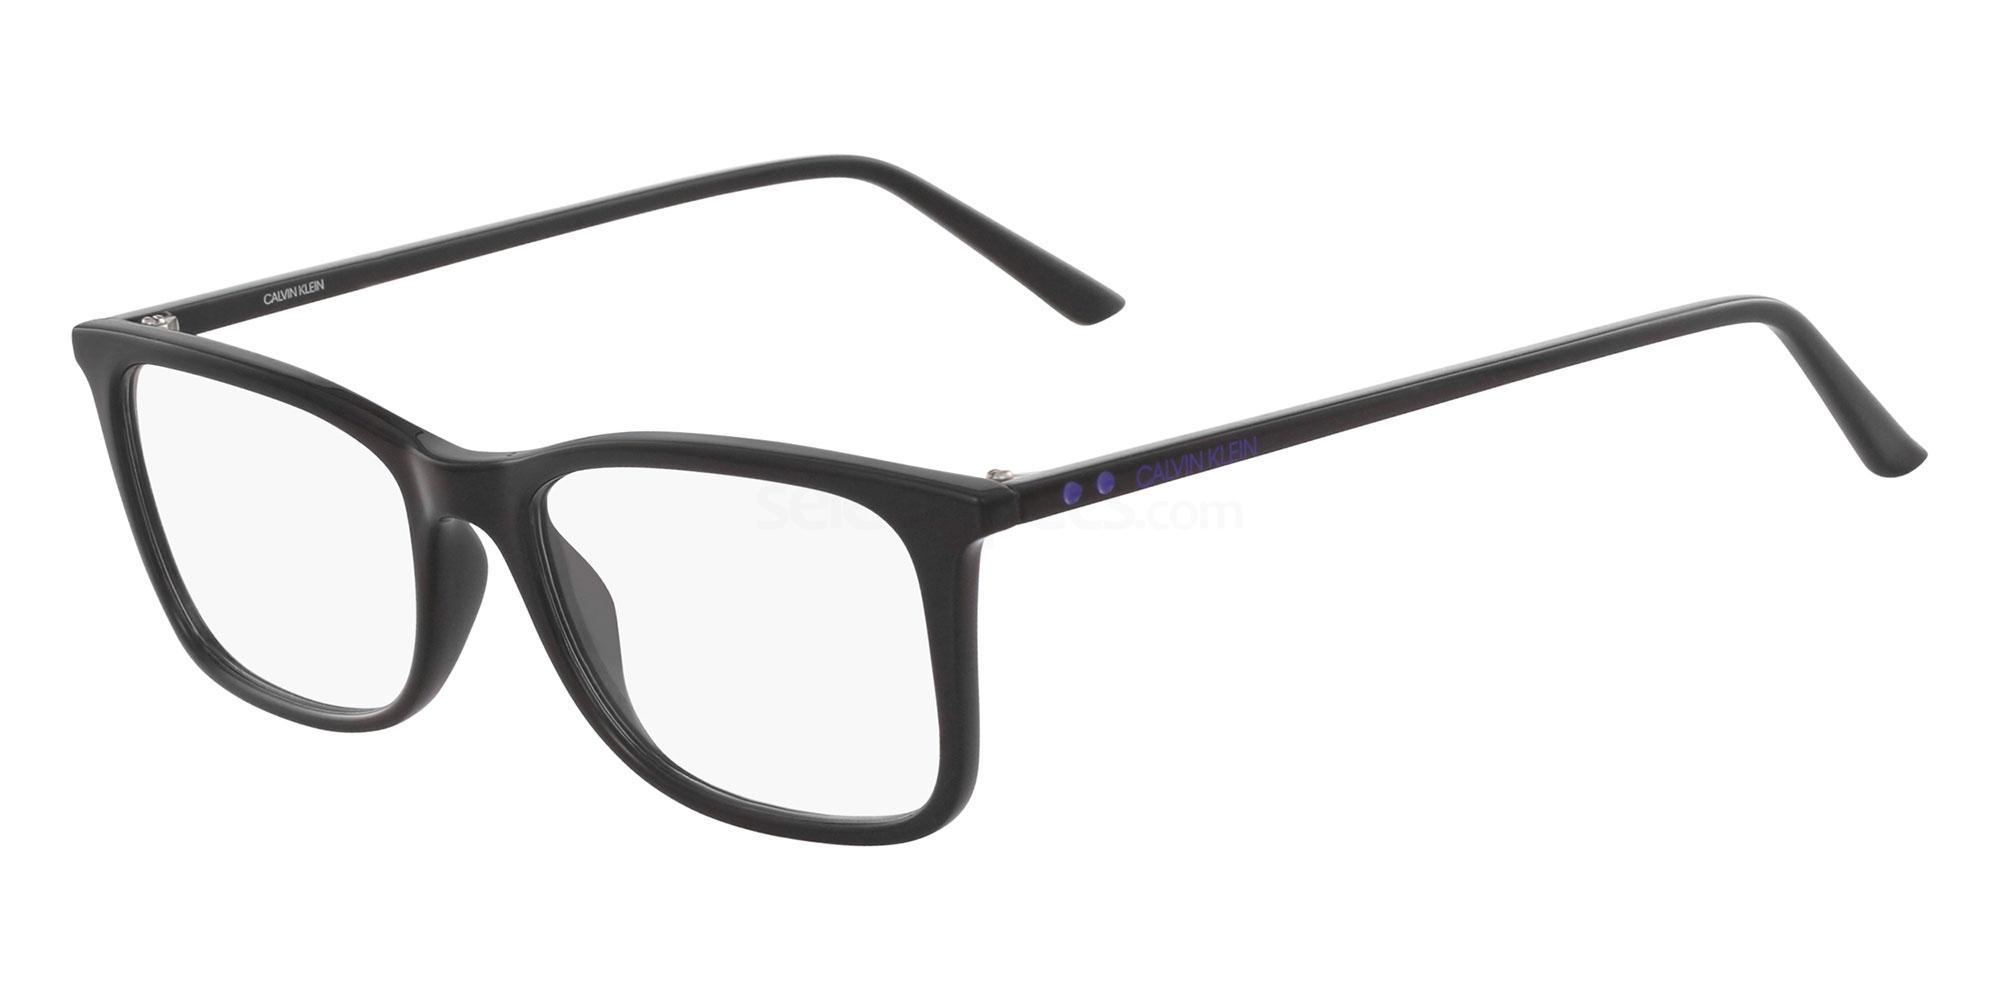 001 CK18545 Glasses, Calvin Klein